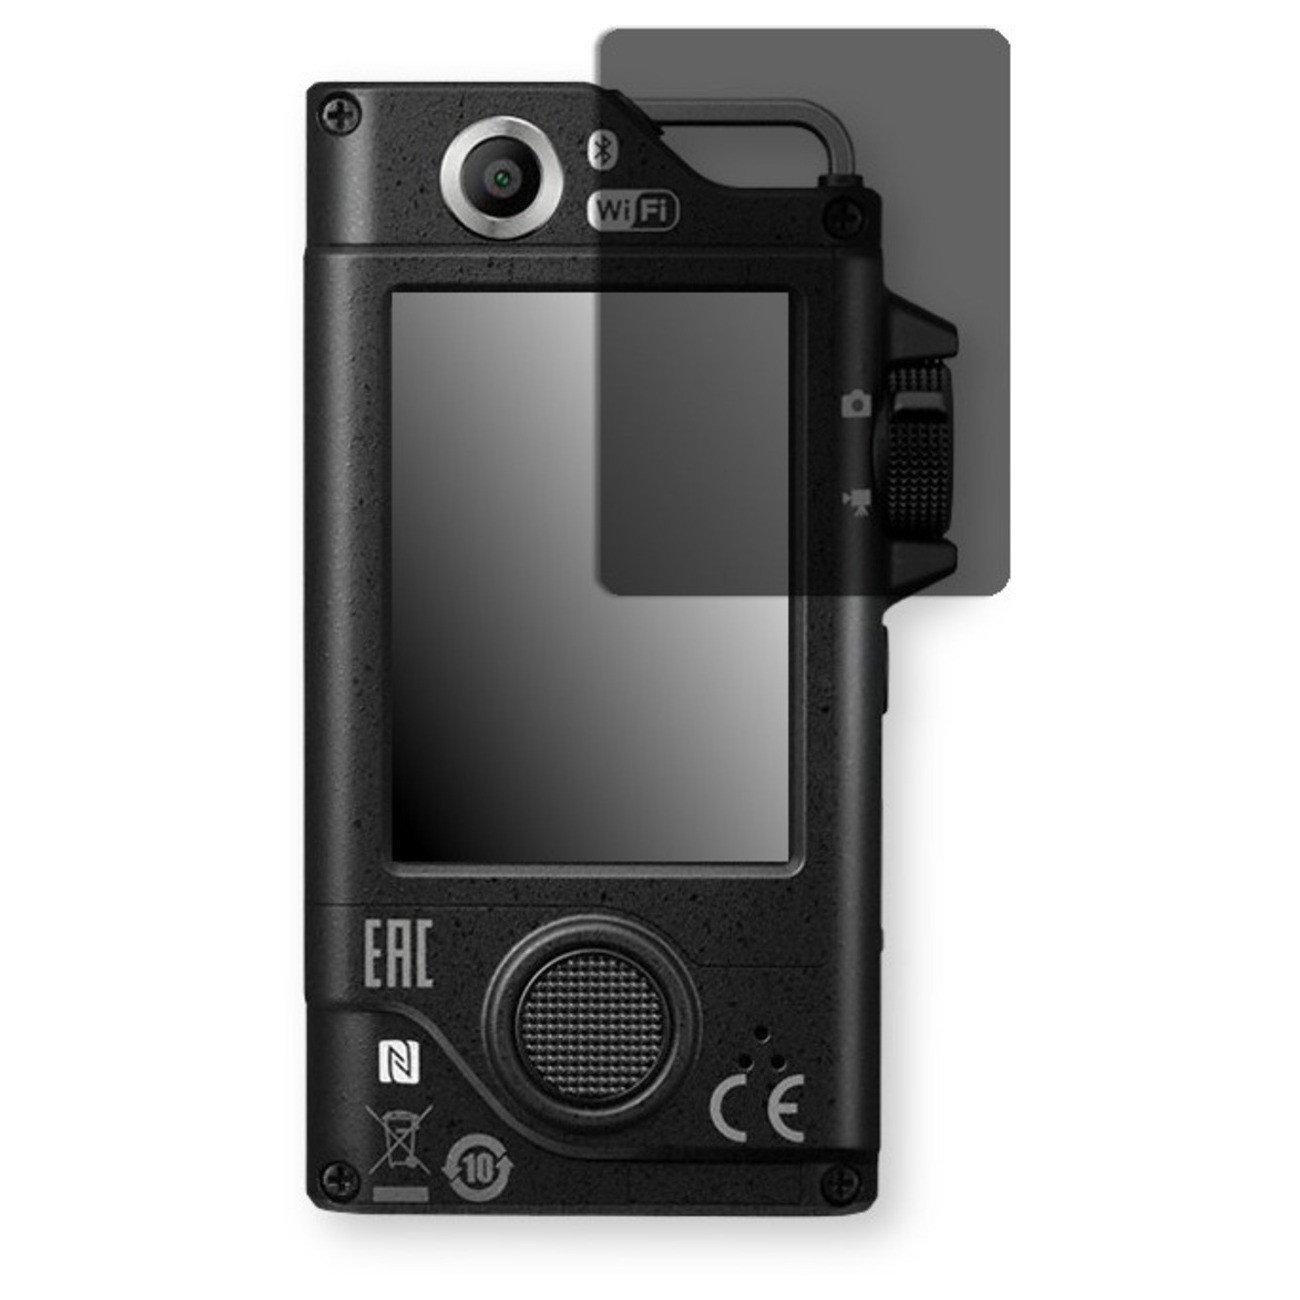 Golebo Screen Film for Privacy protection black for Nikon KeyMission 80 - PREMIUM QUALITY